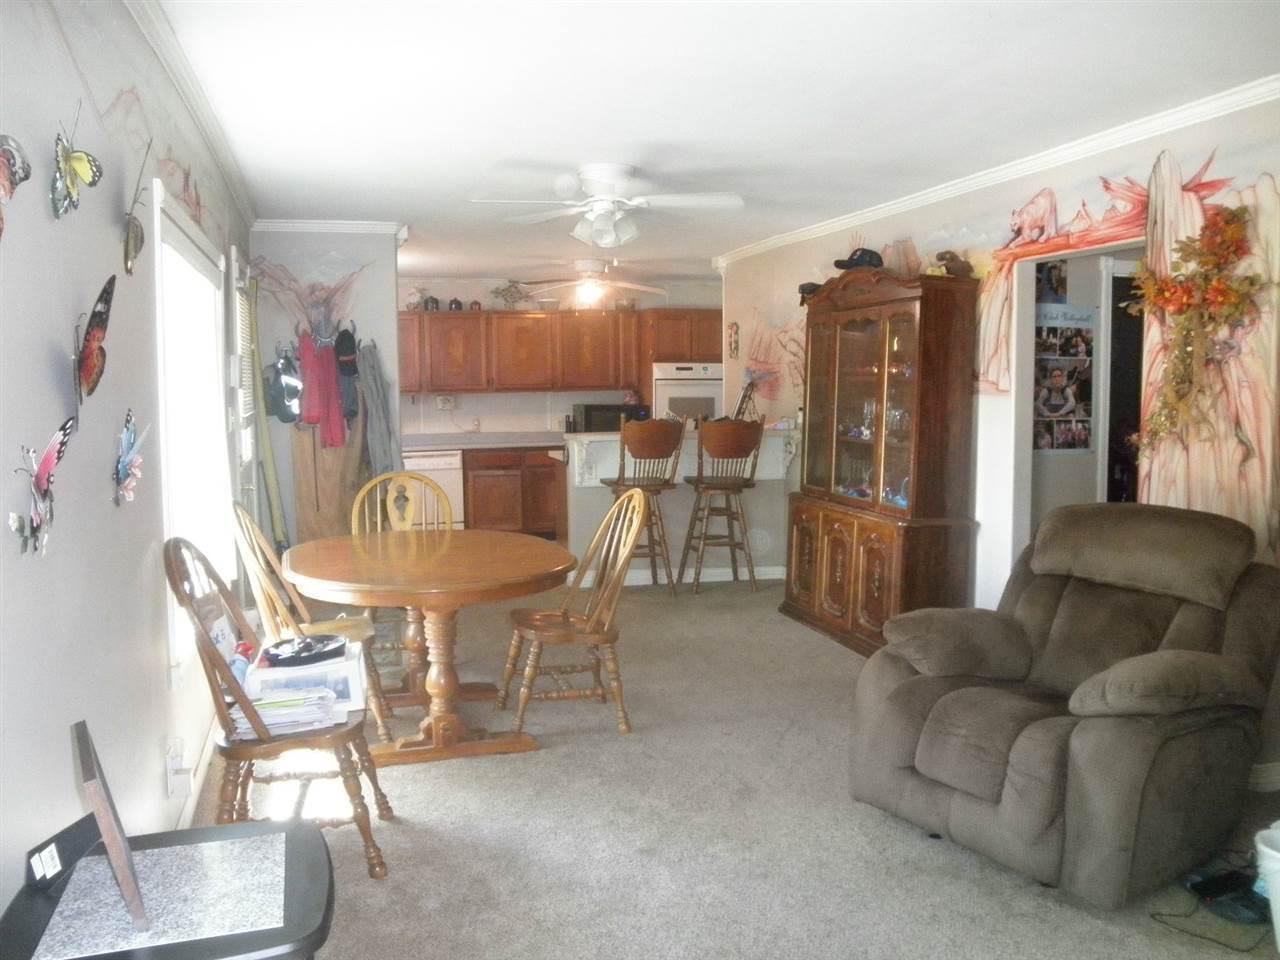 Sold Intraoffice W/MLS | 297 N McCord Road Ponca City, OK 74604 3